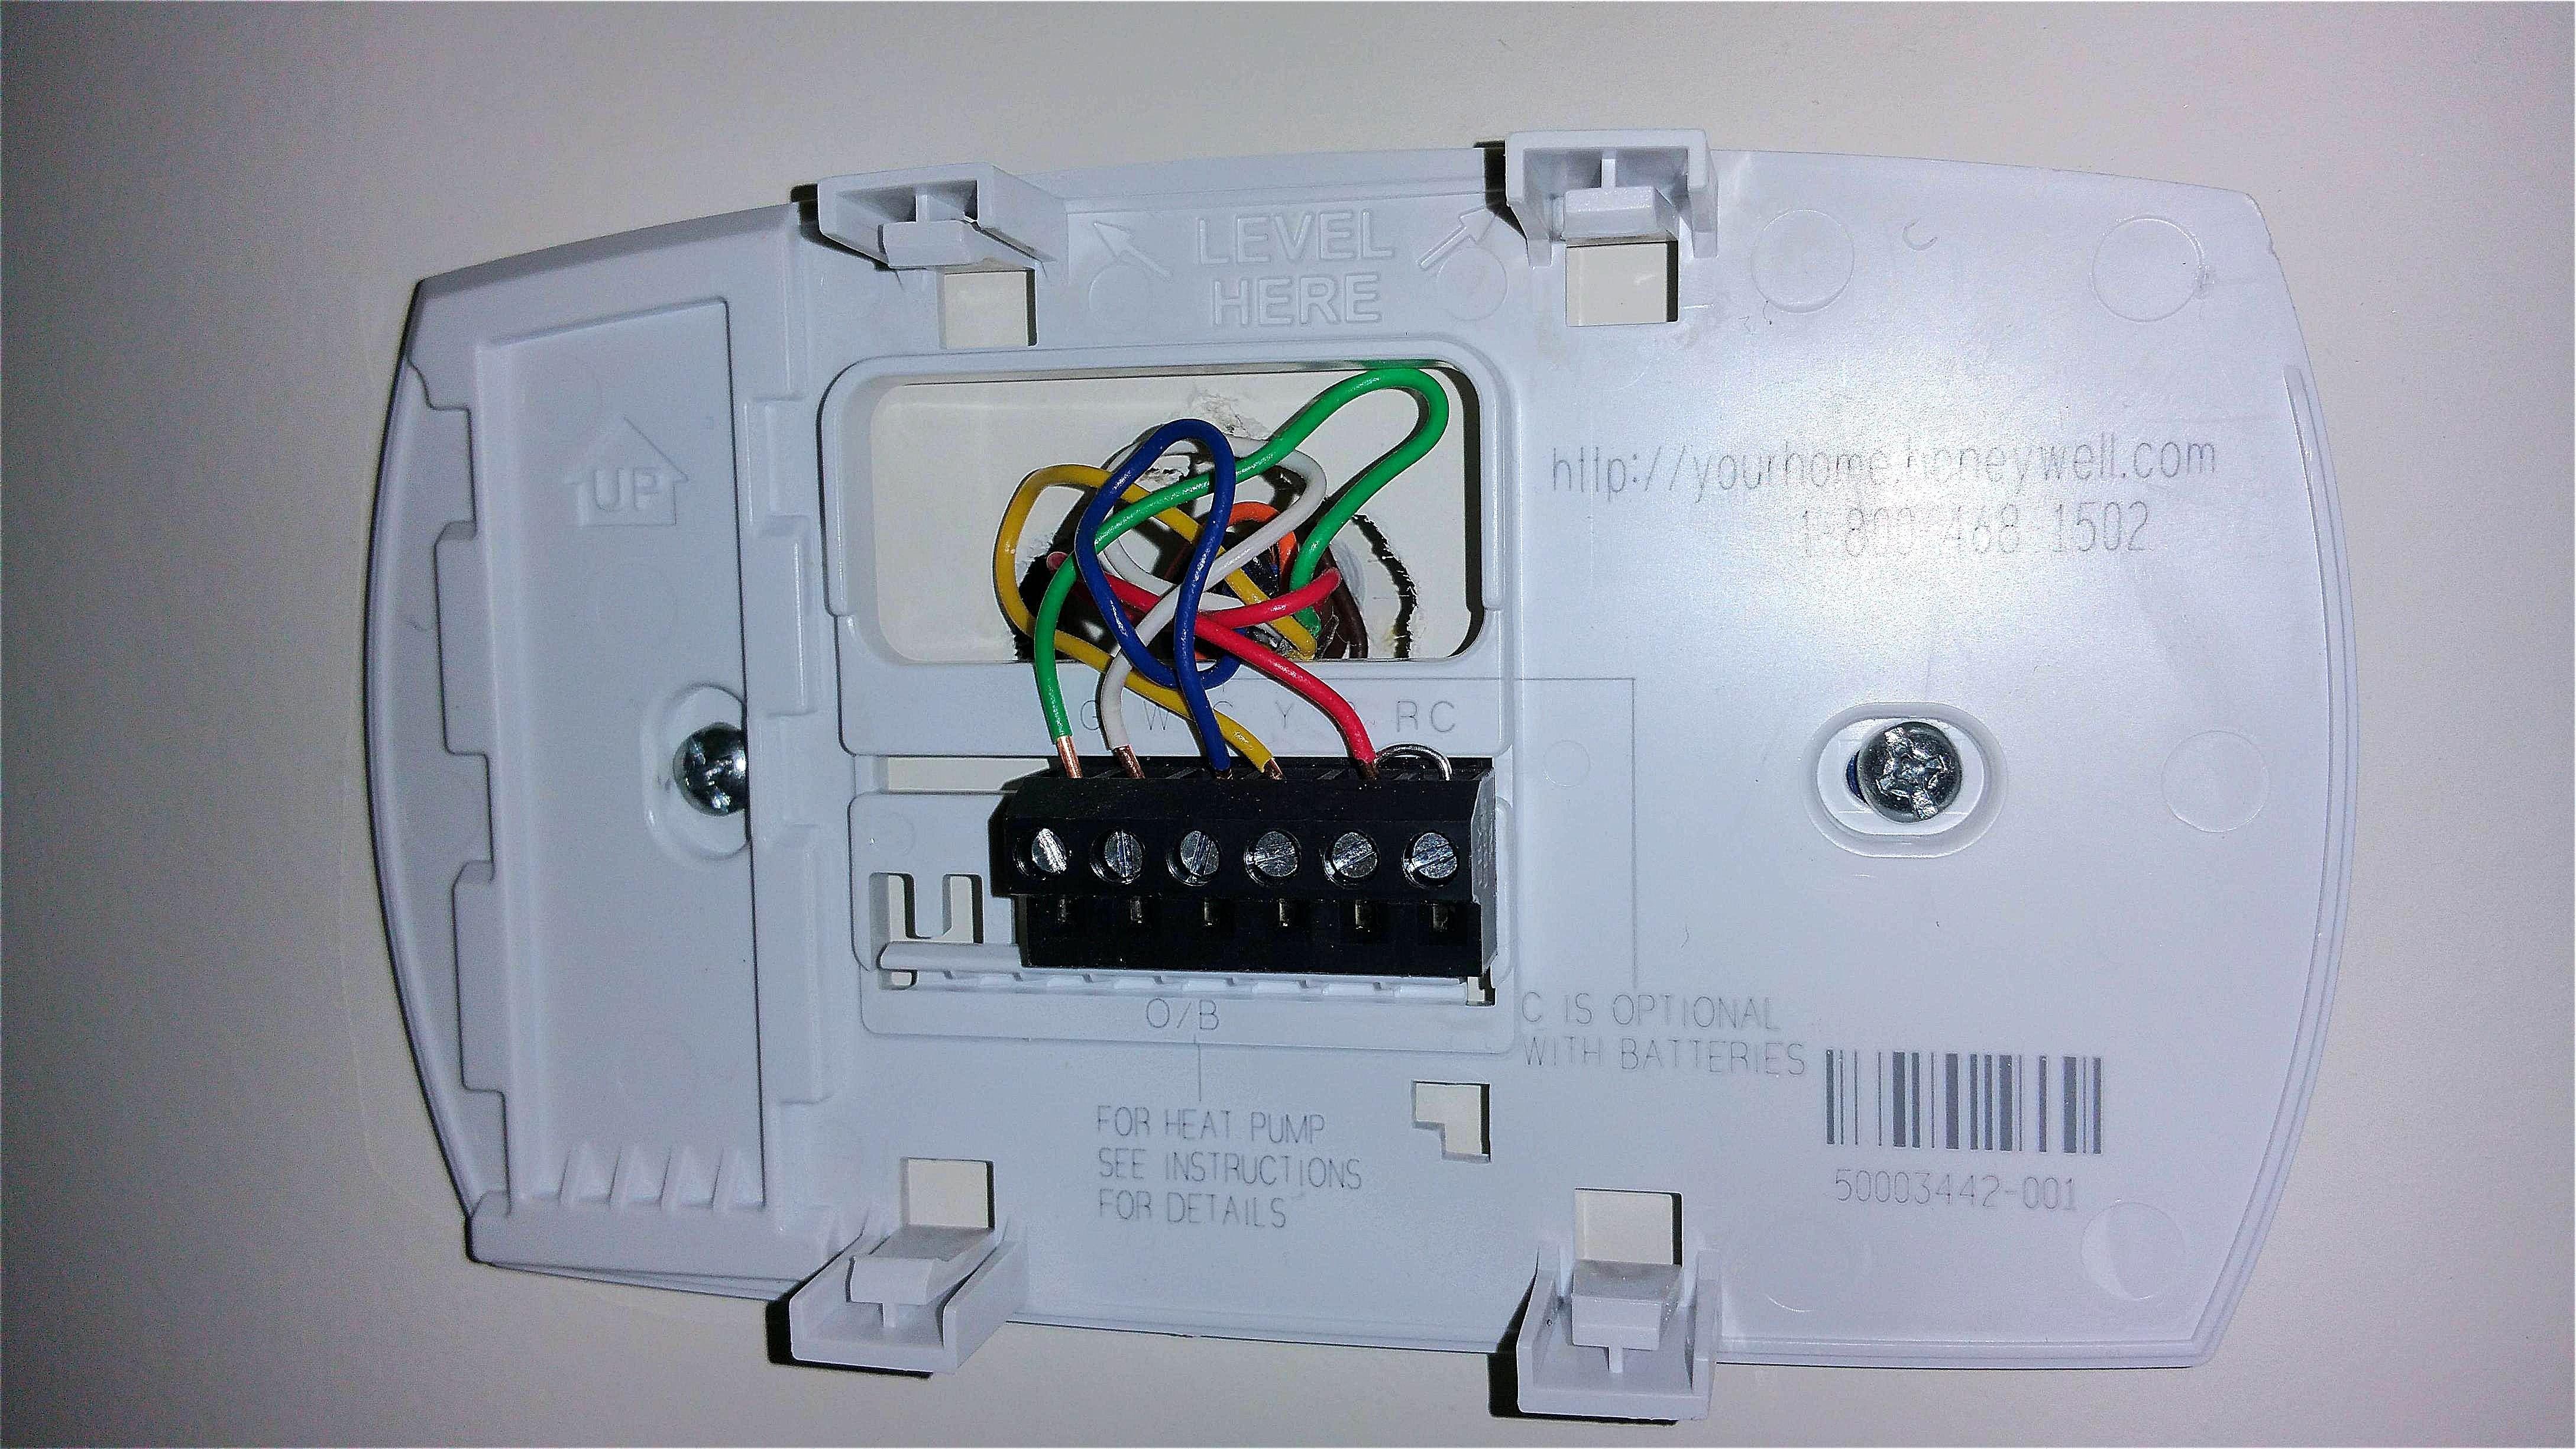 Honeywell Heat Pump Thermostat Wiring Diagram Thoritsolutions